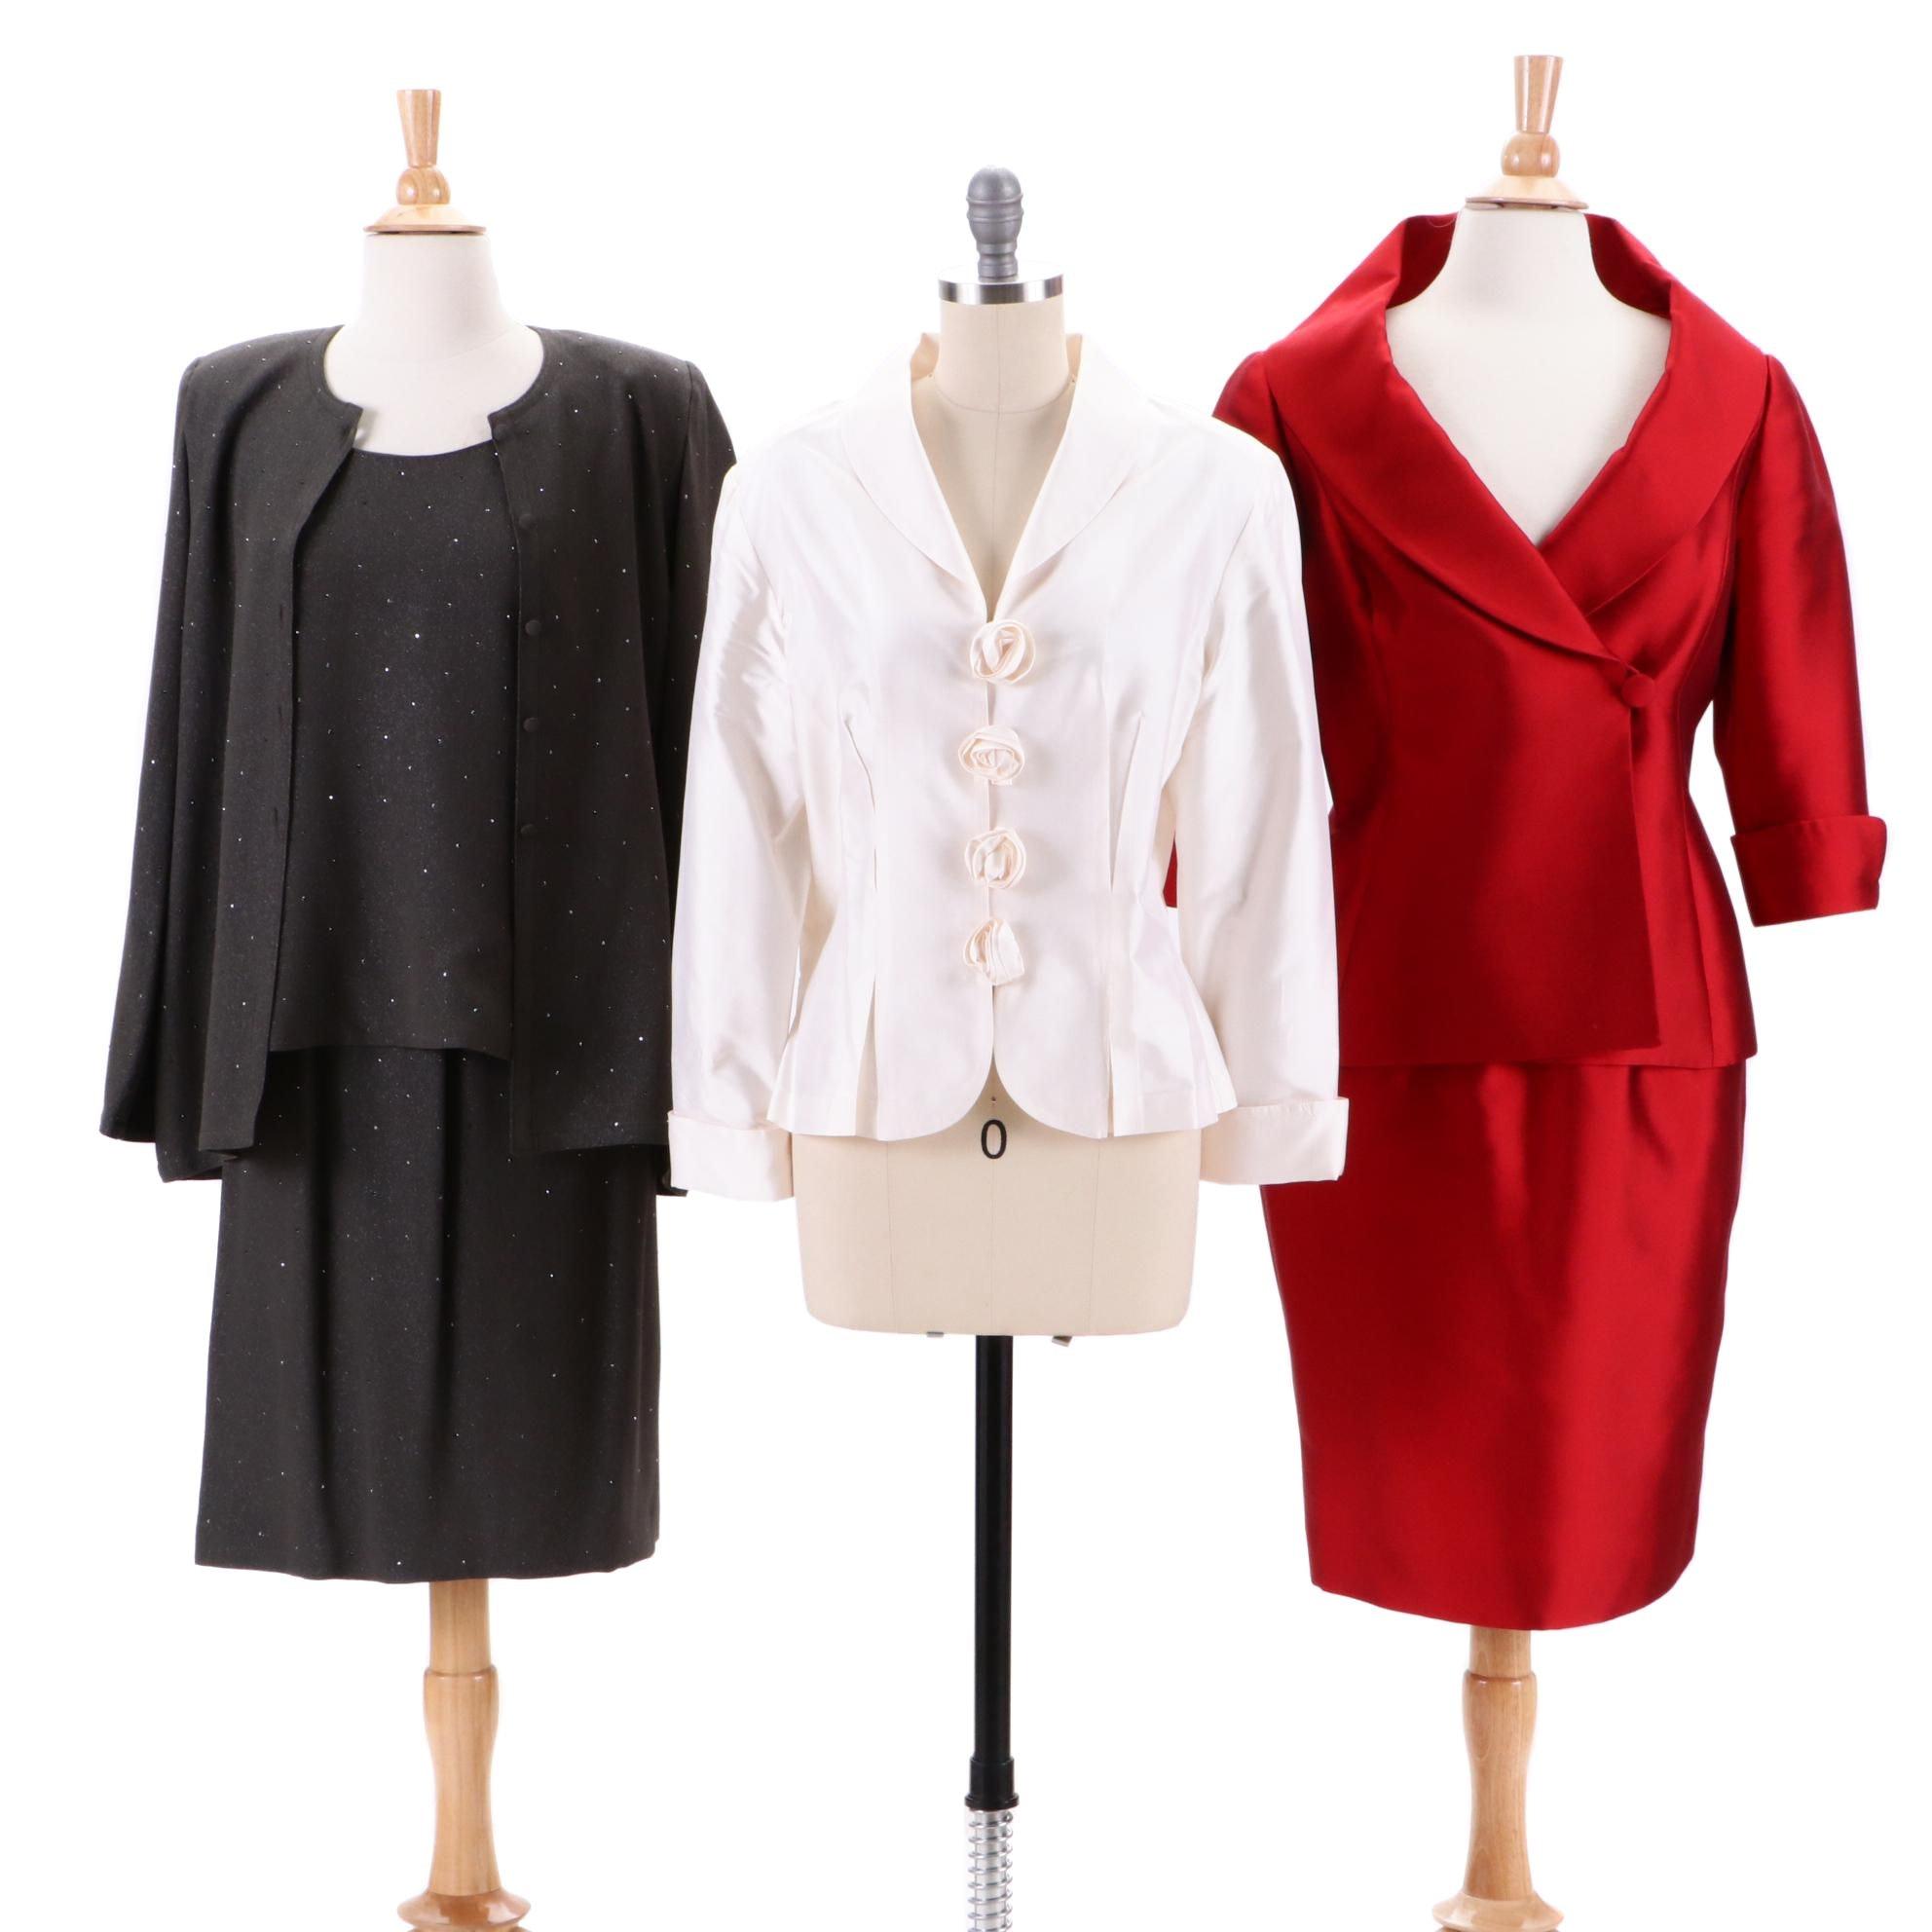 Sansappelle Skirt Suit, Marisa Baratelli Jacket and D&K Collection Skirt Suit